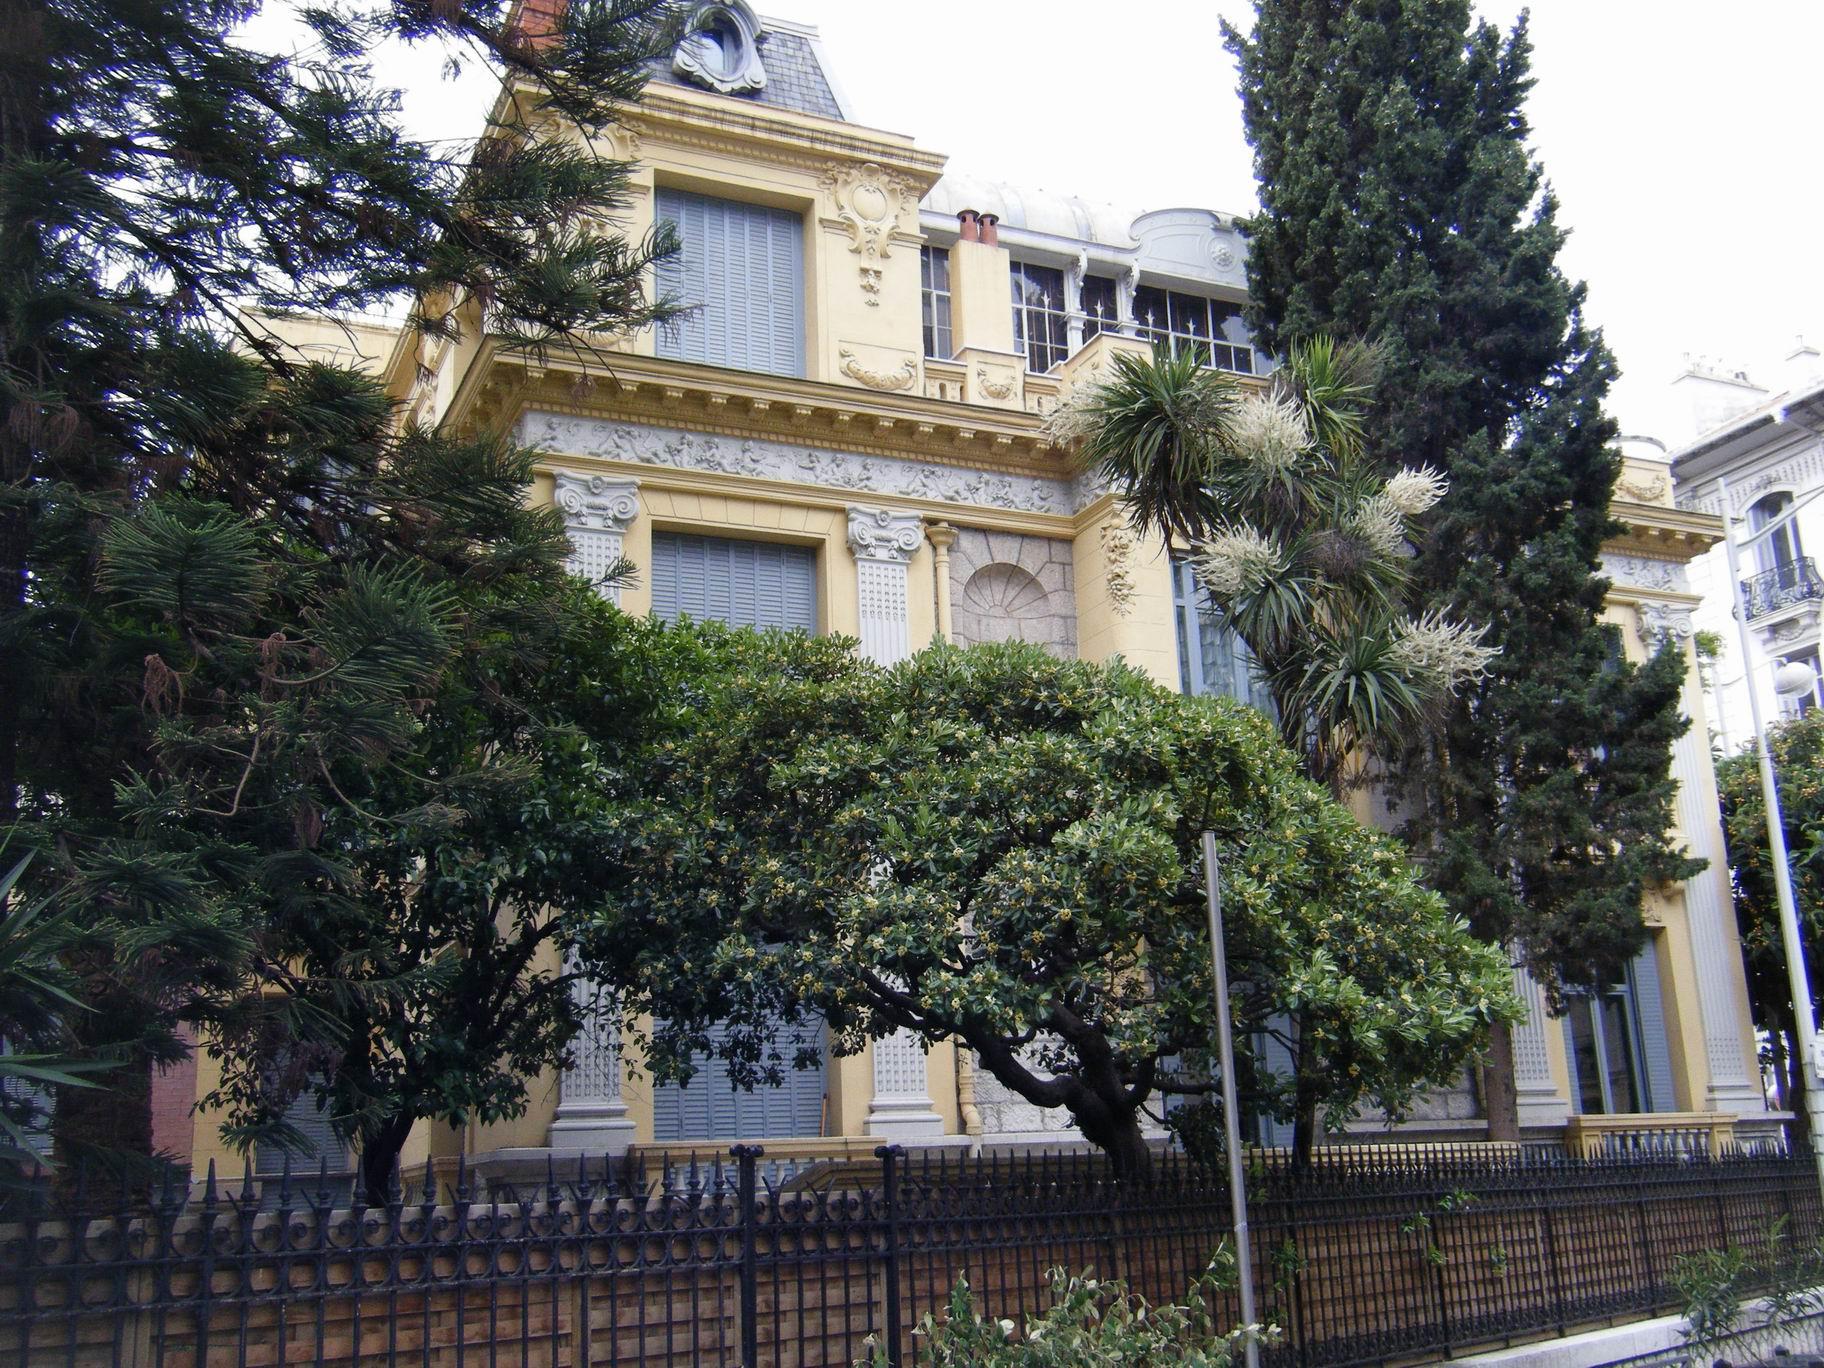 Belle facade de villa les meilleures id es concernant for Les plus belles facades de villa